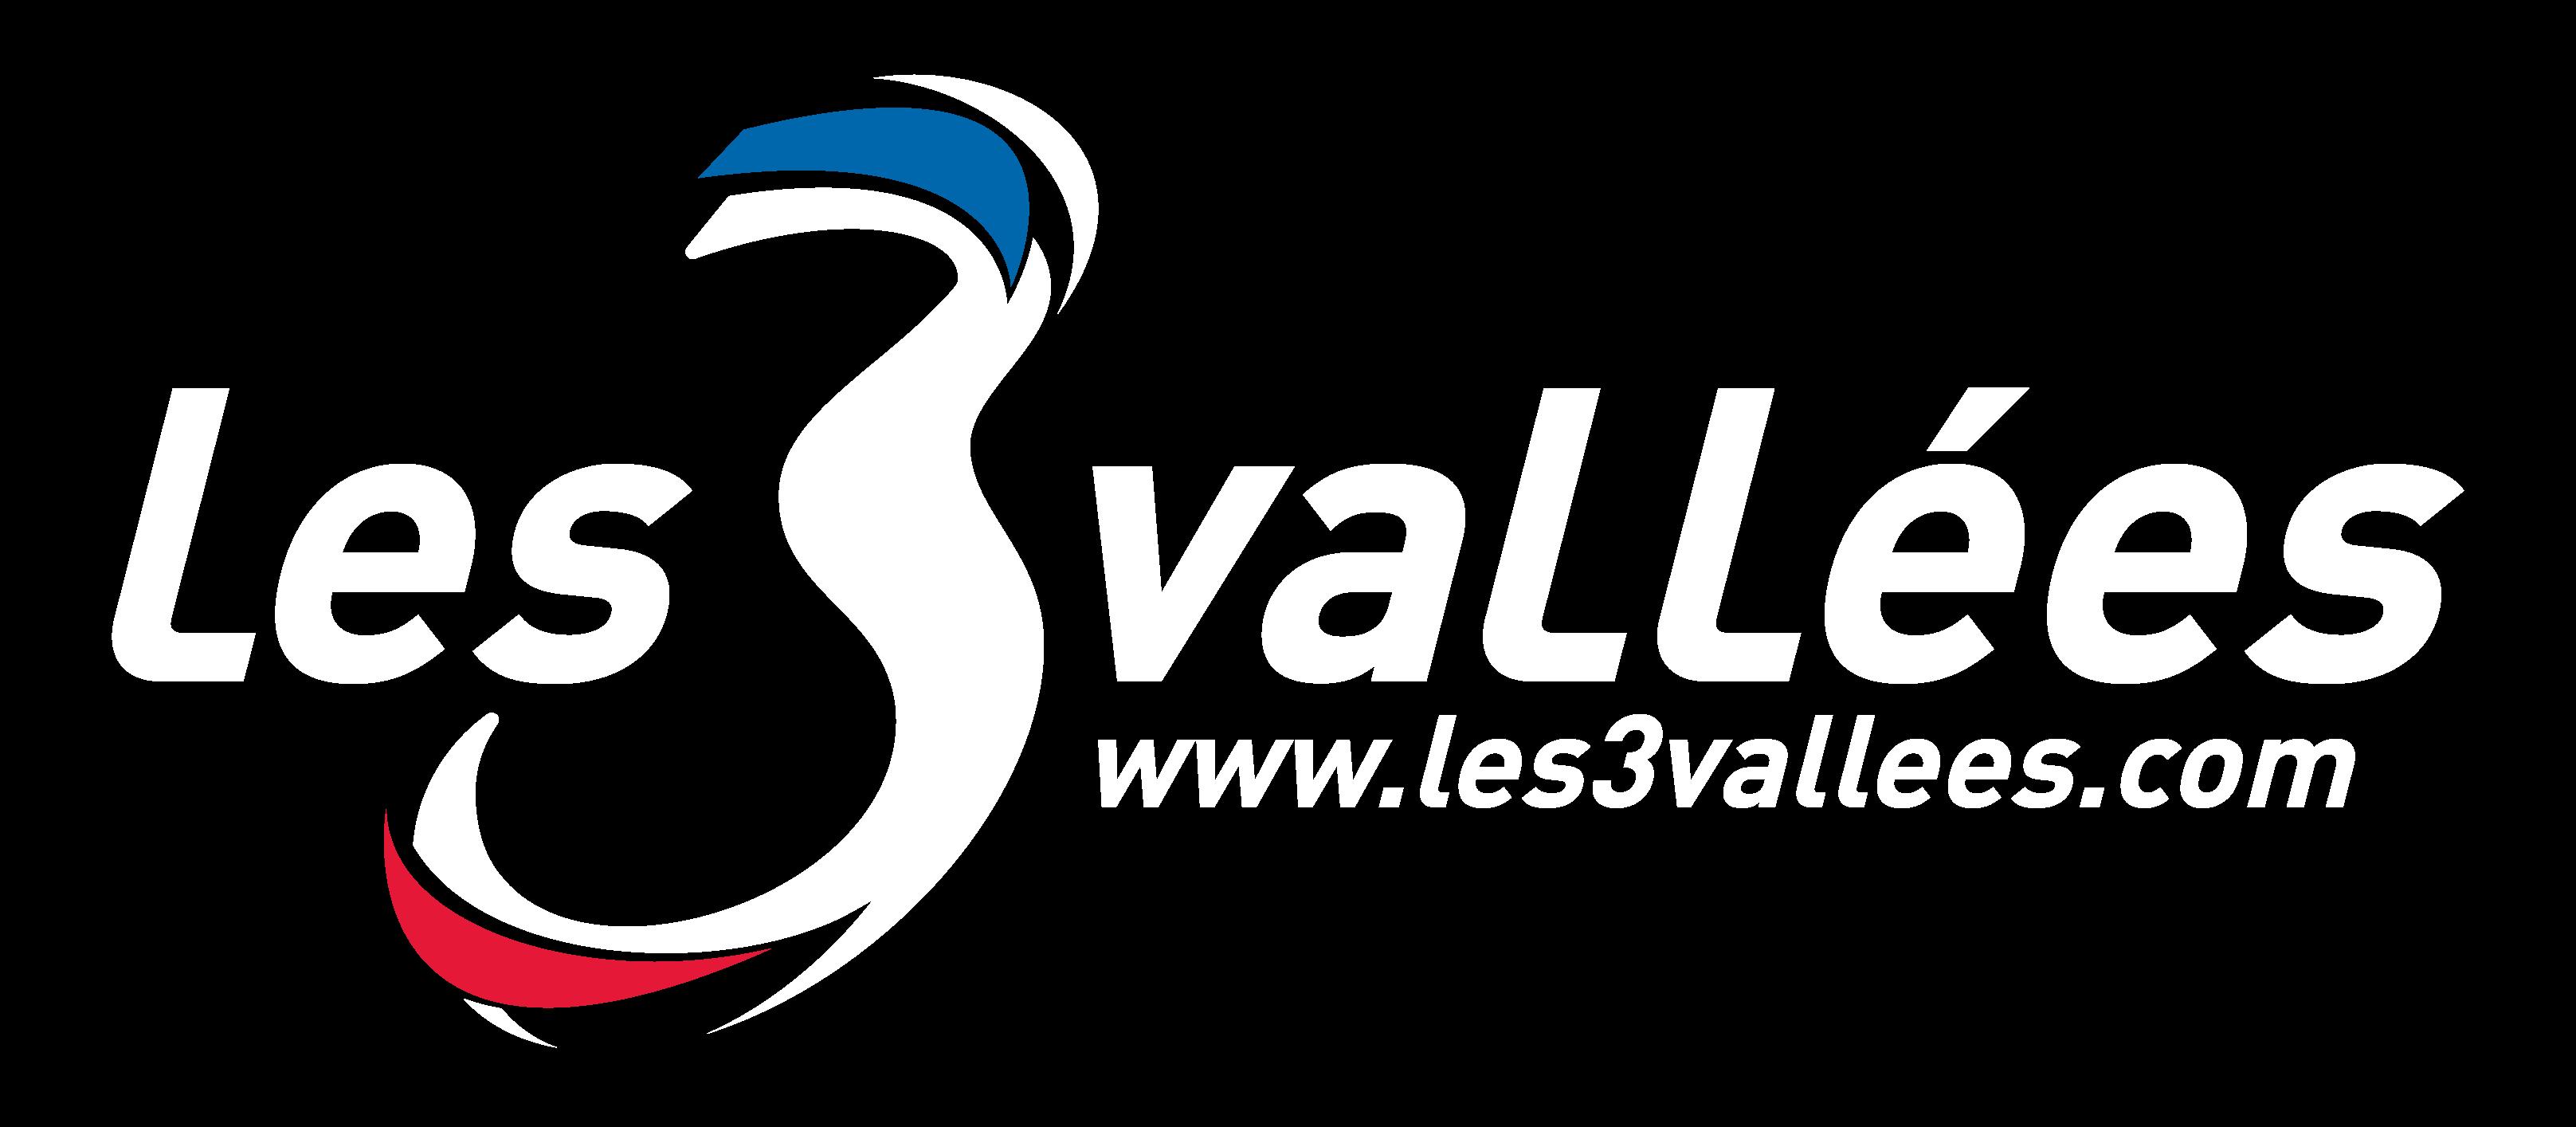 Les 3 vallées domaine skiable